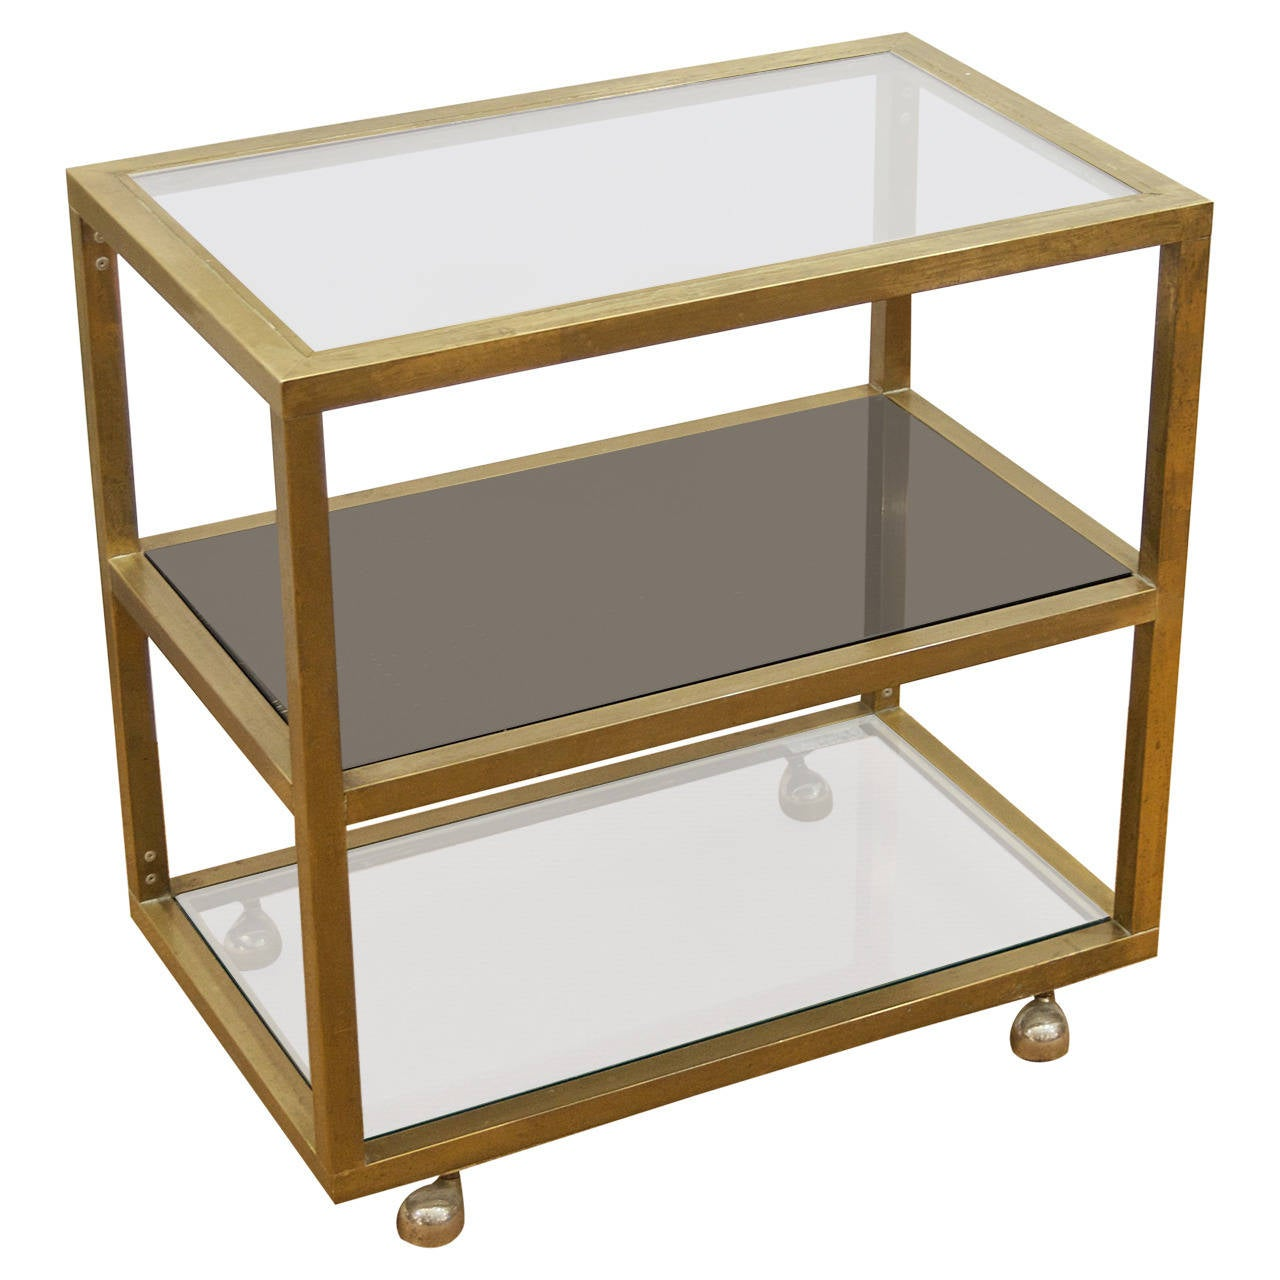 Modernist Brass and Three-Tier Smoked Glass Bar Cart